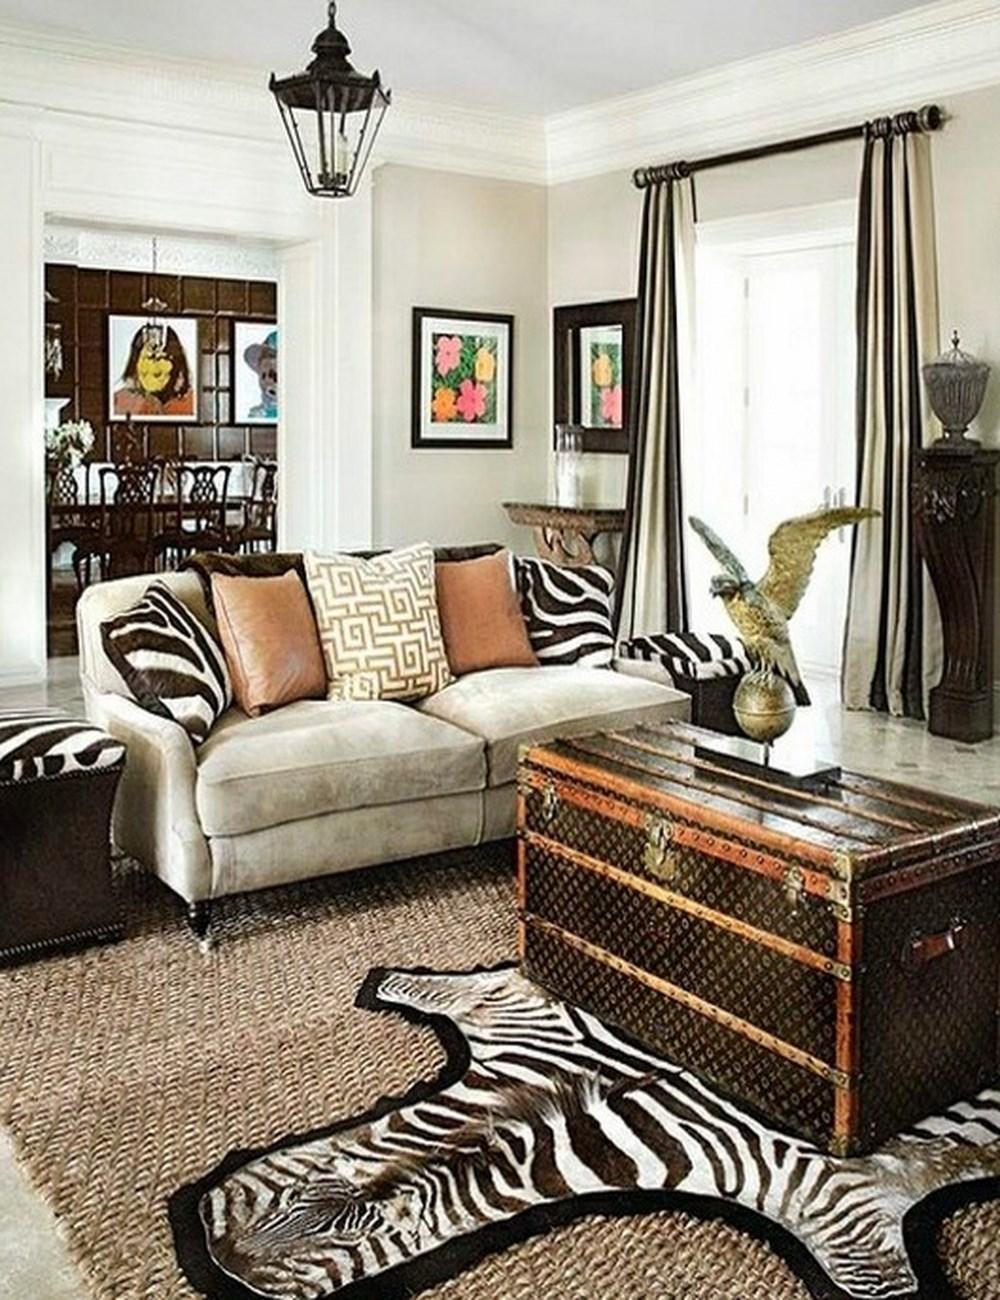 Leopard Print Living Room Decor Zebra Print Bedroom Ideas Best Teen Rooms Unique Bedroom Ideas